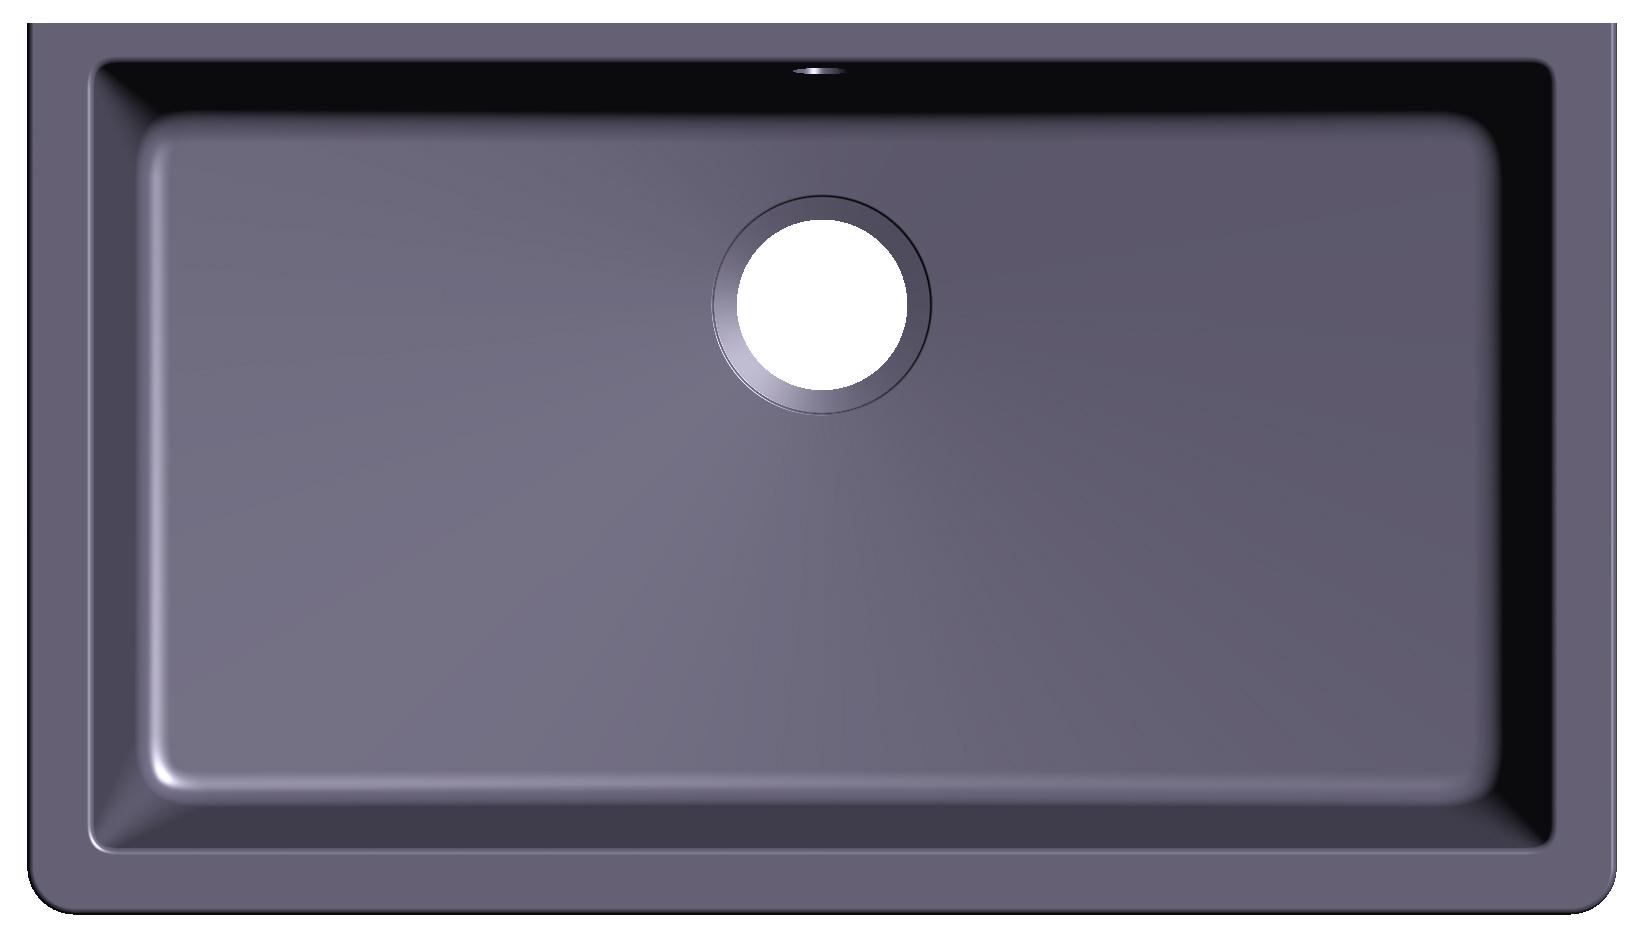 AS607